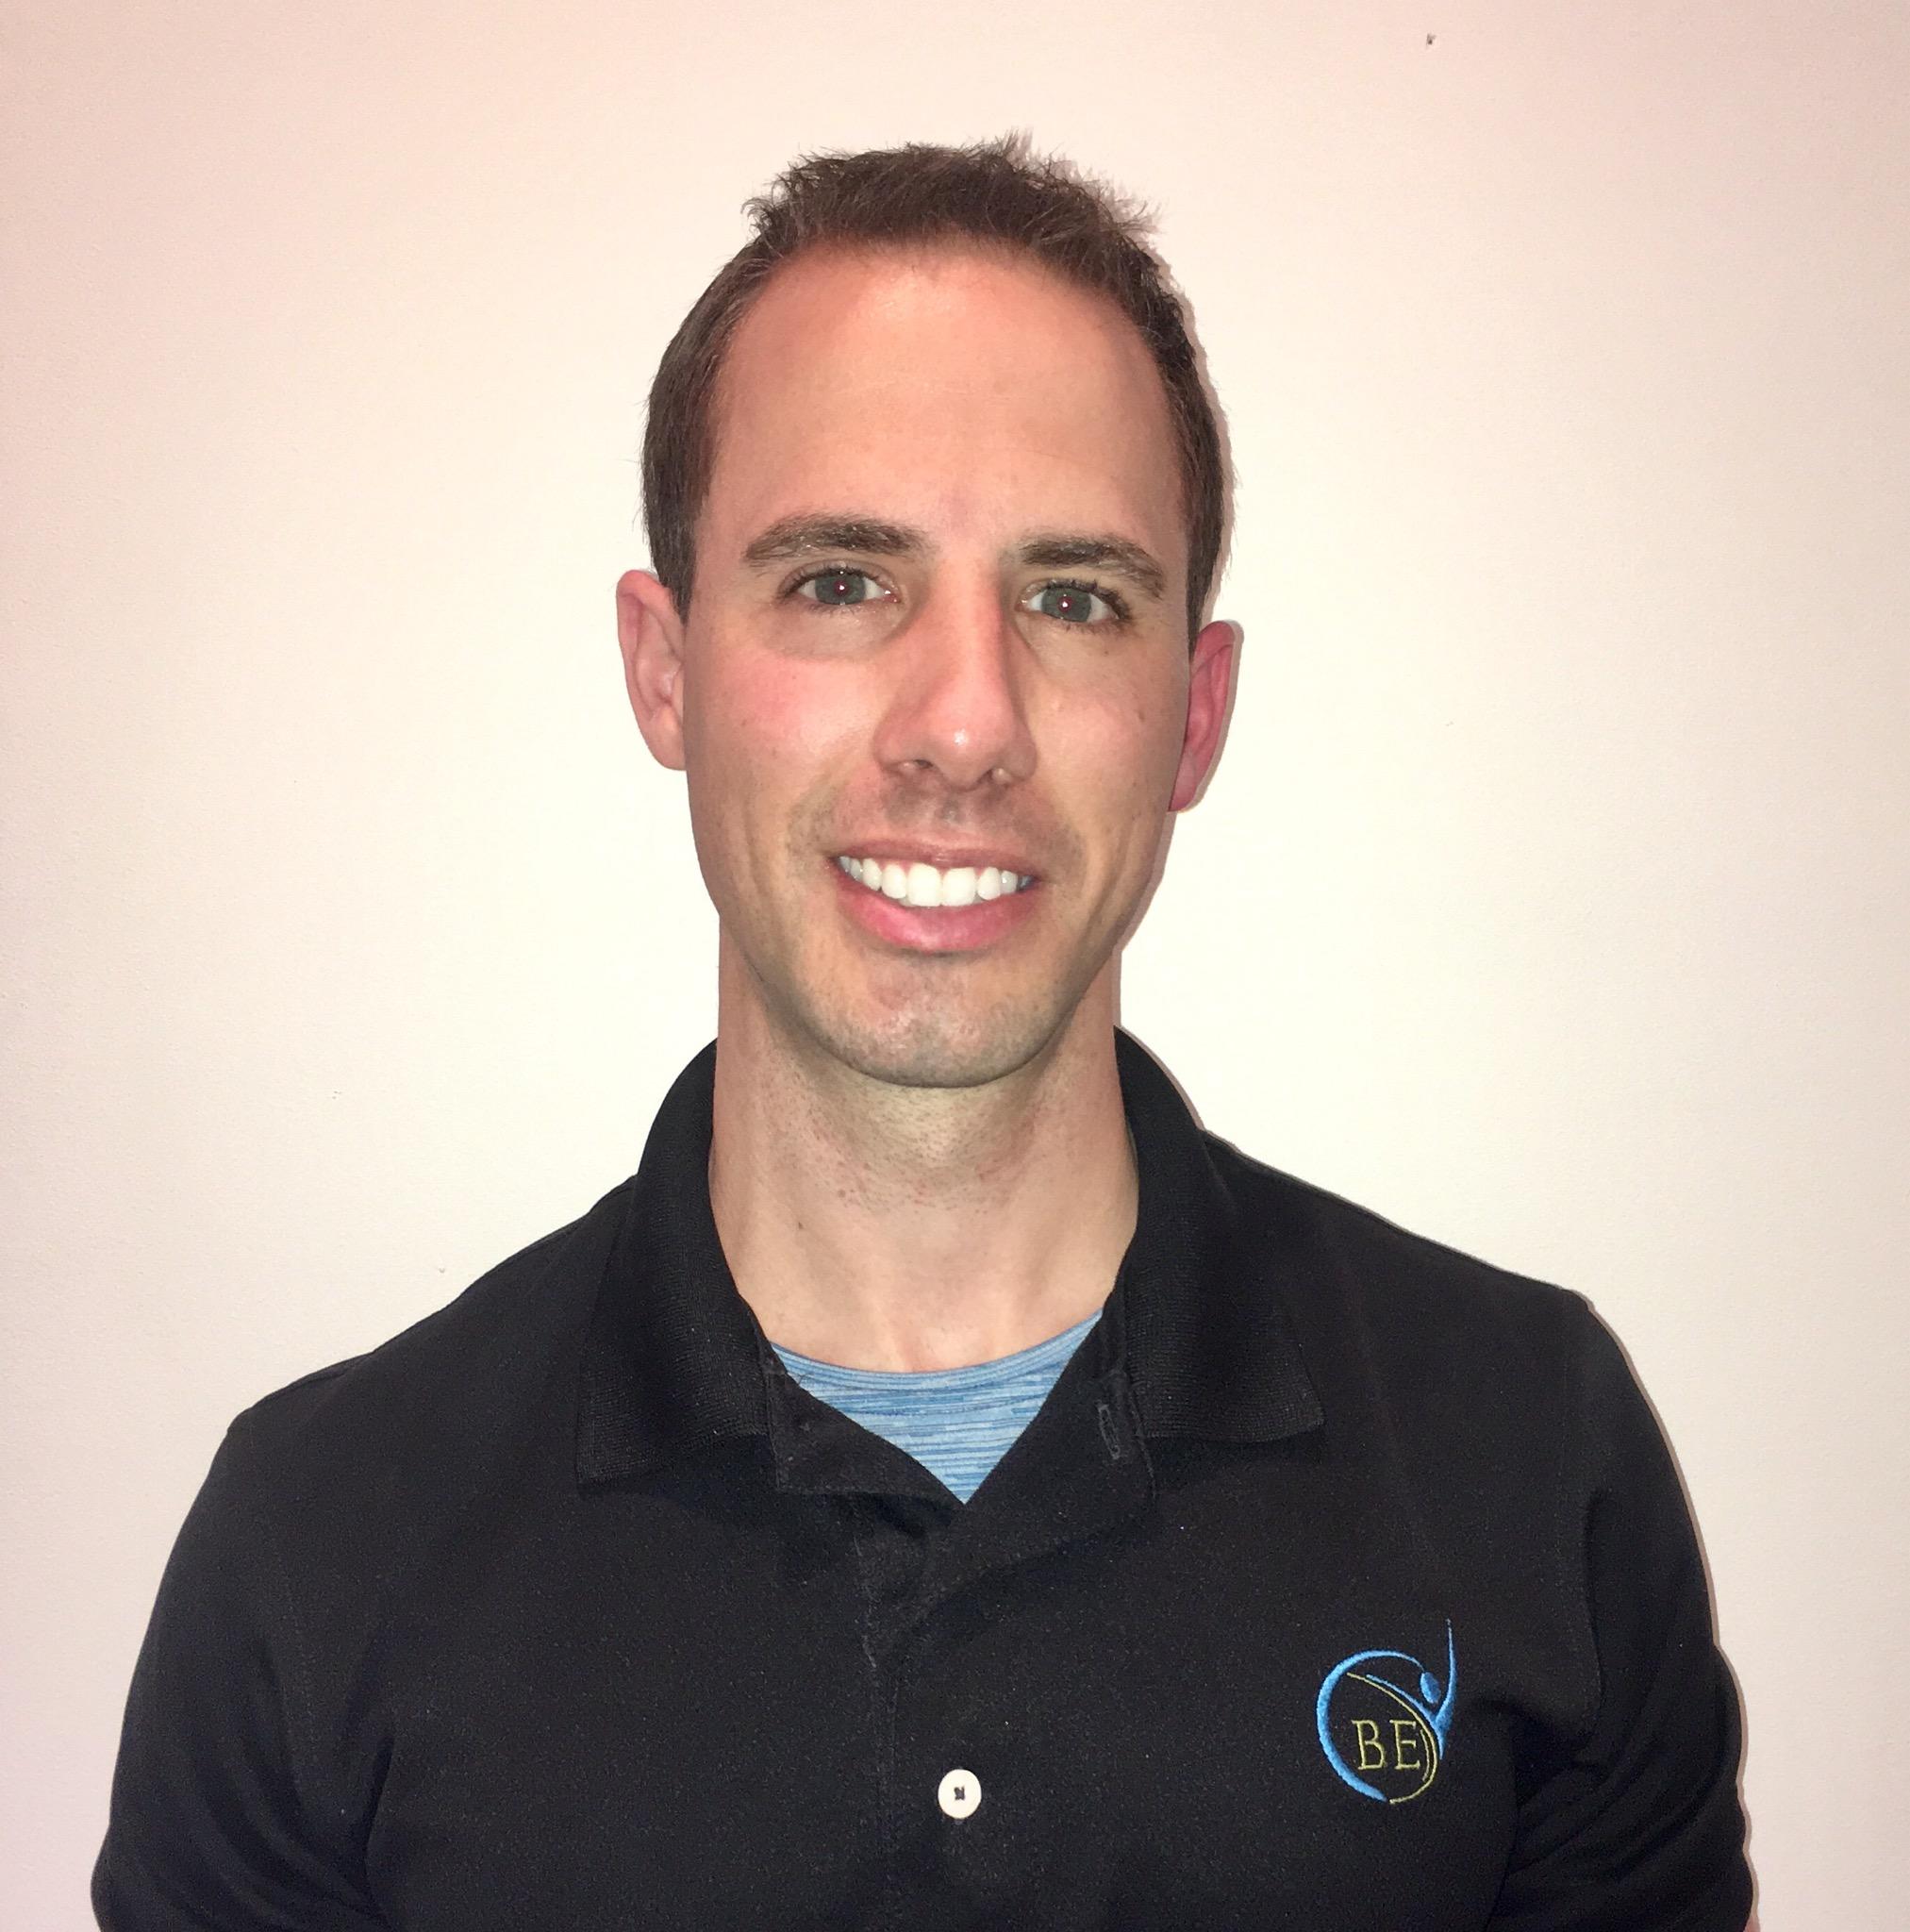 Mark Radio, Body Elite GM and trainer